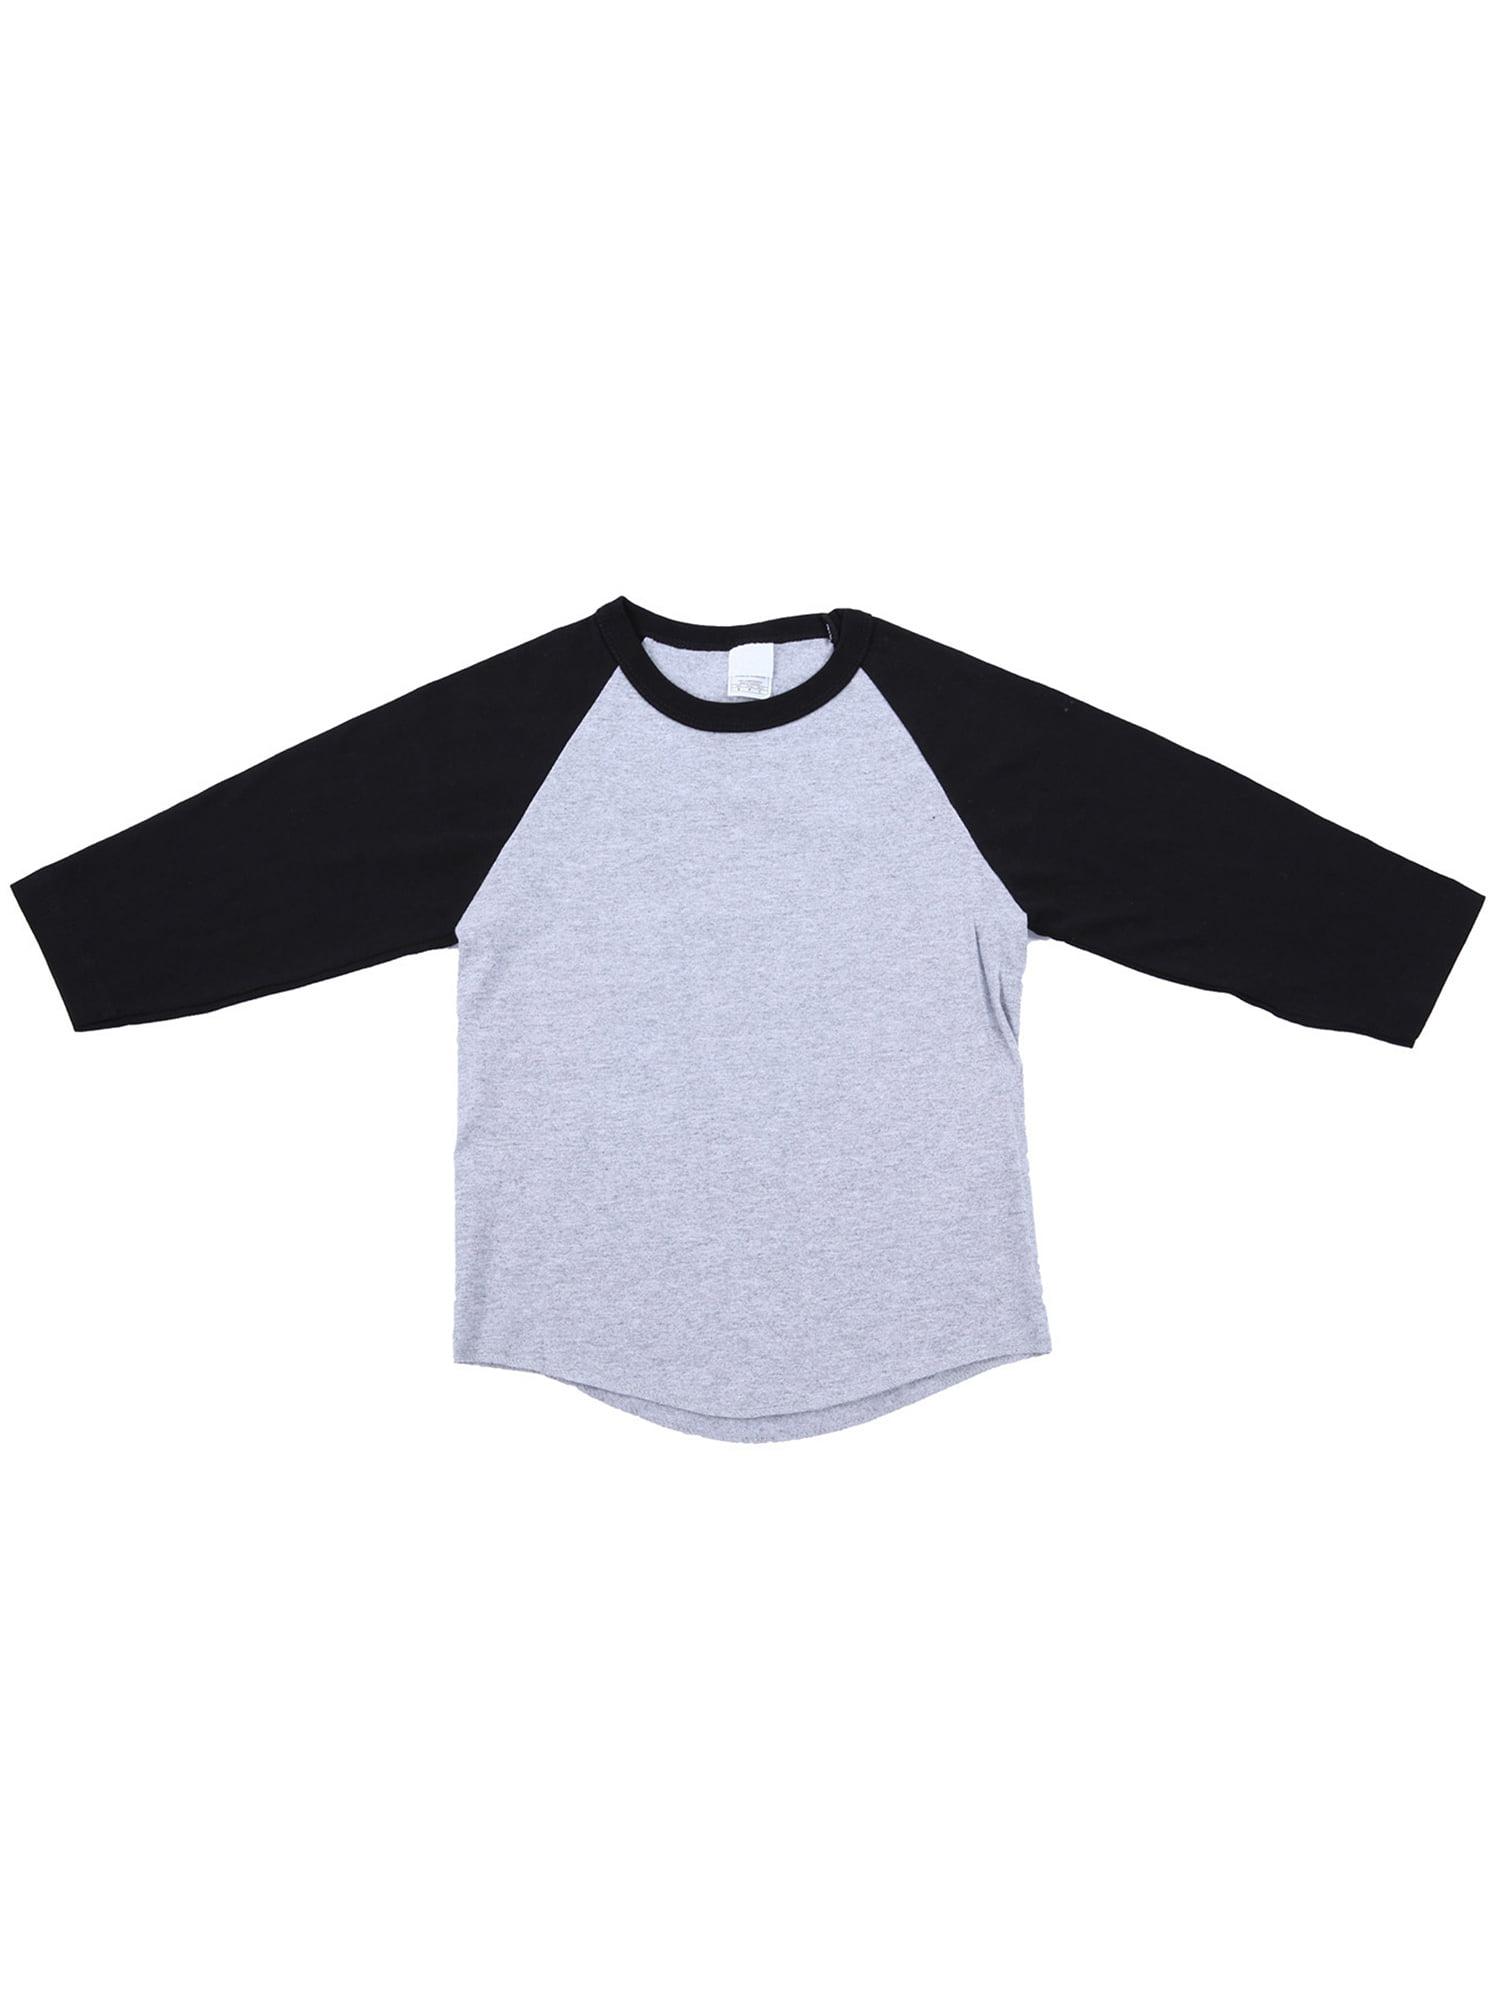 Ola Mari Unisex Kids Raglan 3/4 Sleeve Baseball T Shirt, White/Red, XX Small